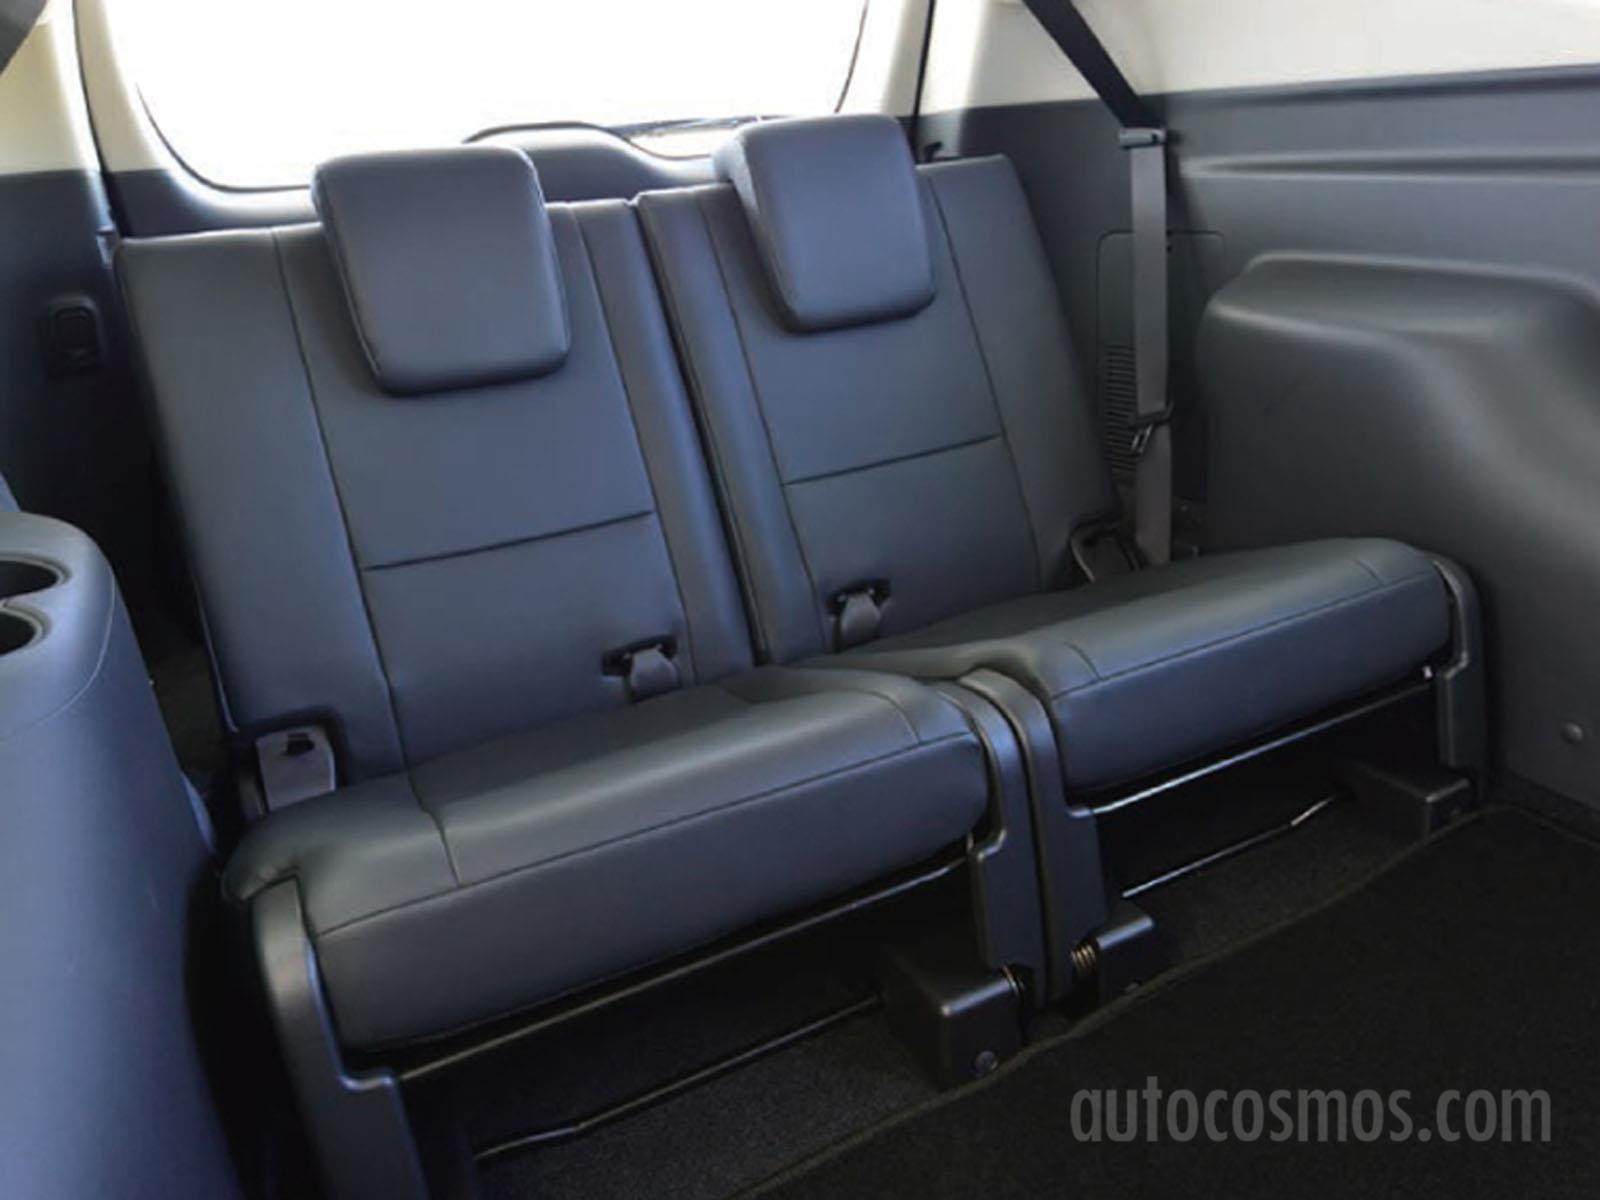 Mitsubishi Colt Car Seat Covers